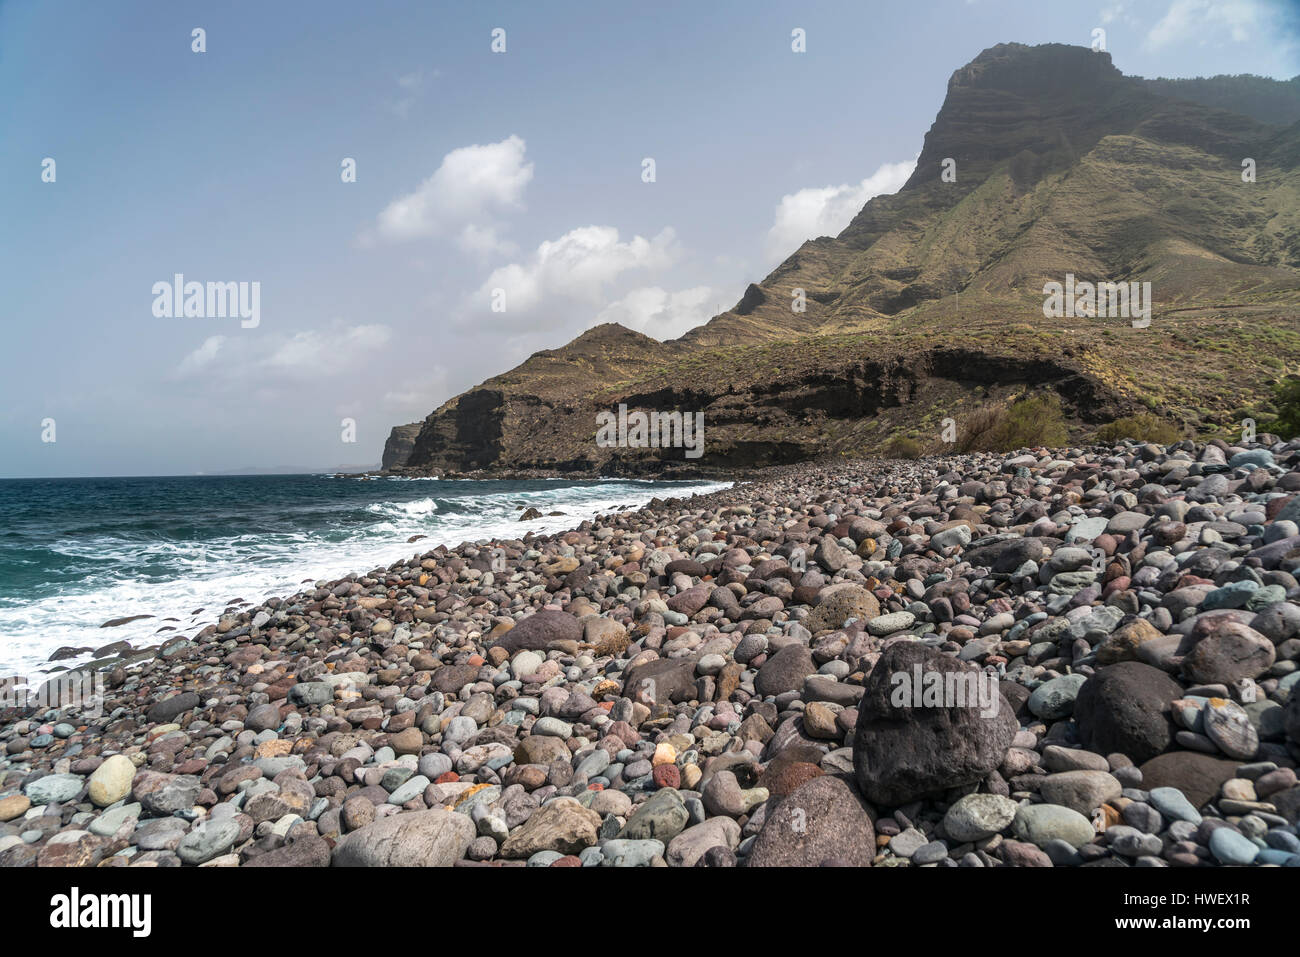 Strand Playa de la Guayedra bei Agaete, Insel Gran Canaria, Kanarische Inseln, Spanien |  Playa de la Guayedra beach Stock Photo